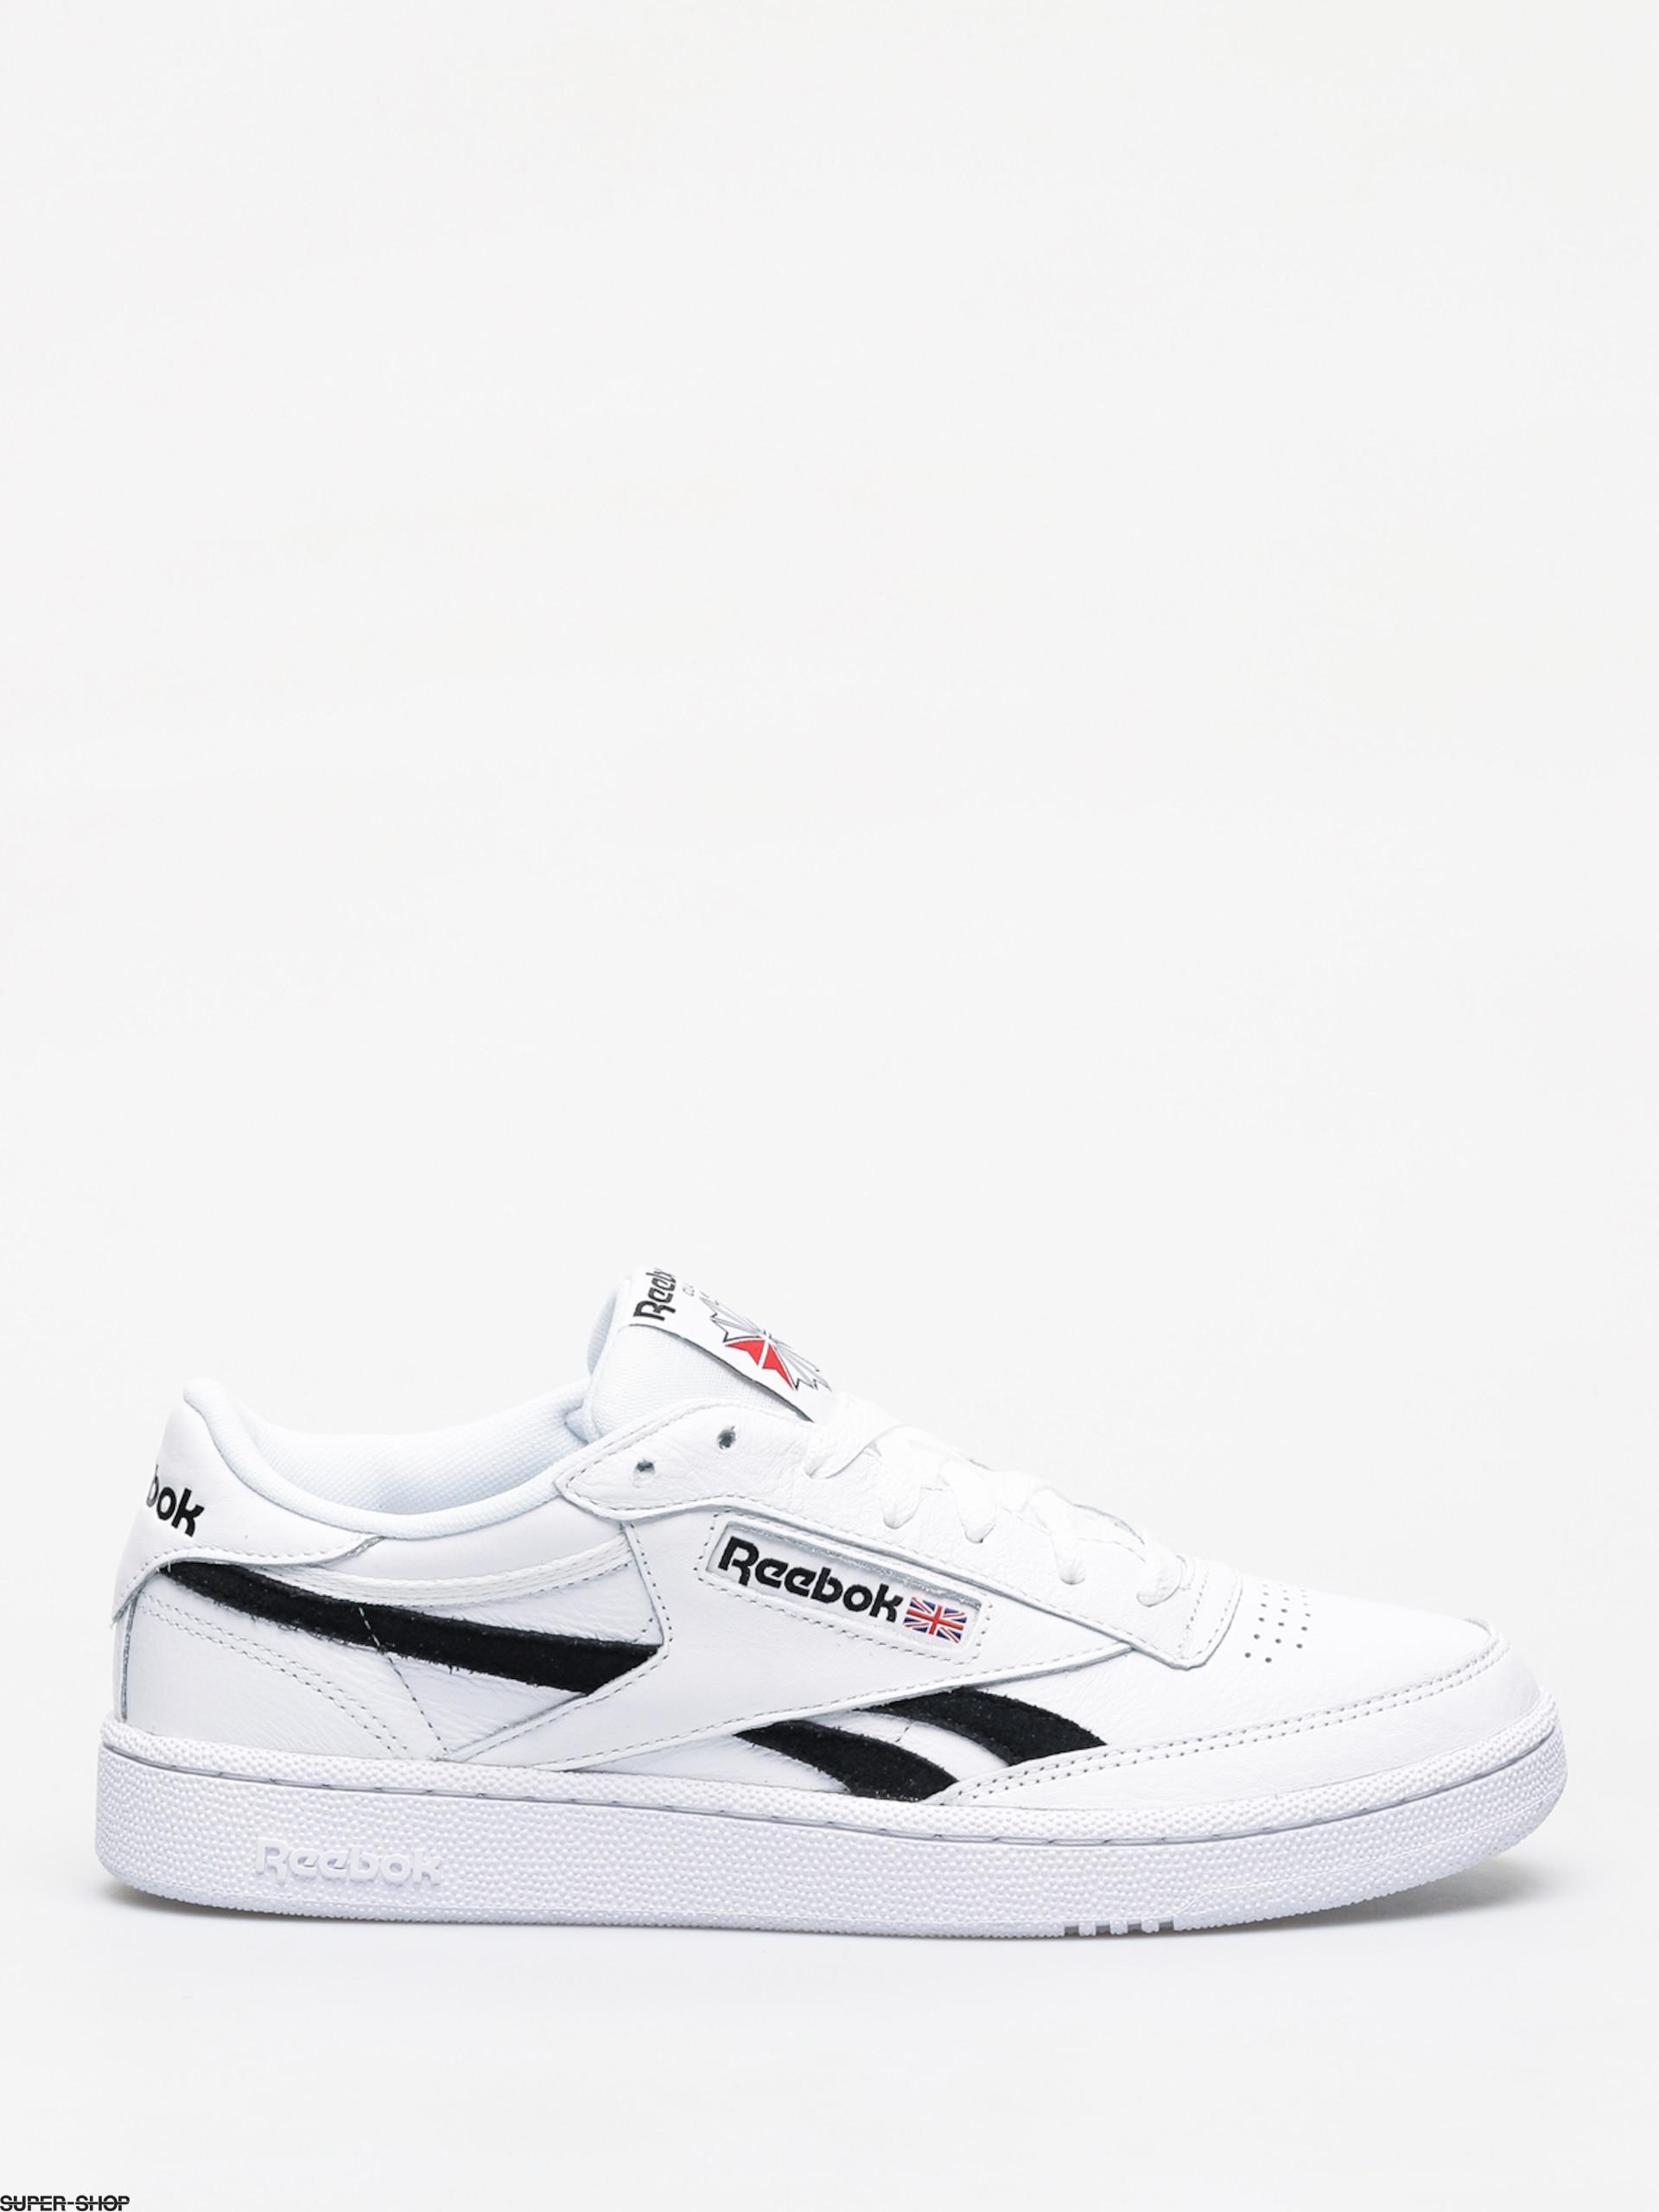 3535d4e70ee 1015935-w1920-reebok-revenge-plus-mu-shoes-white-black.jpg